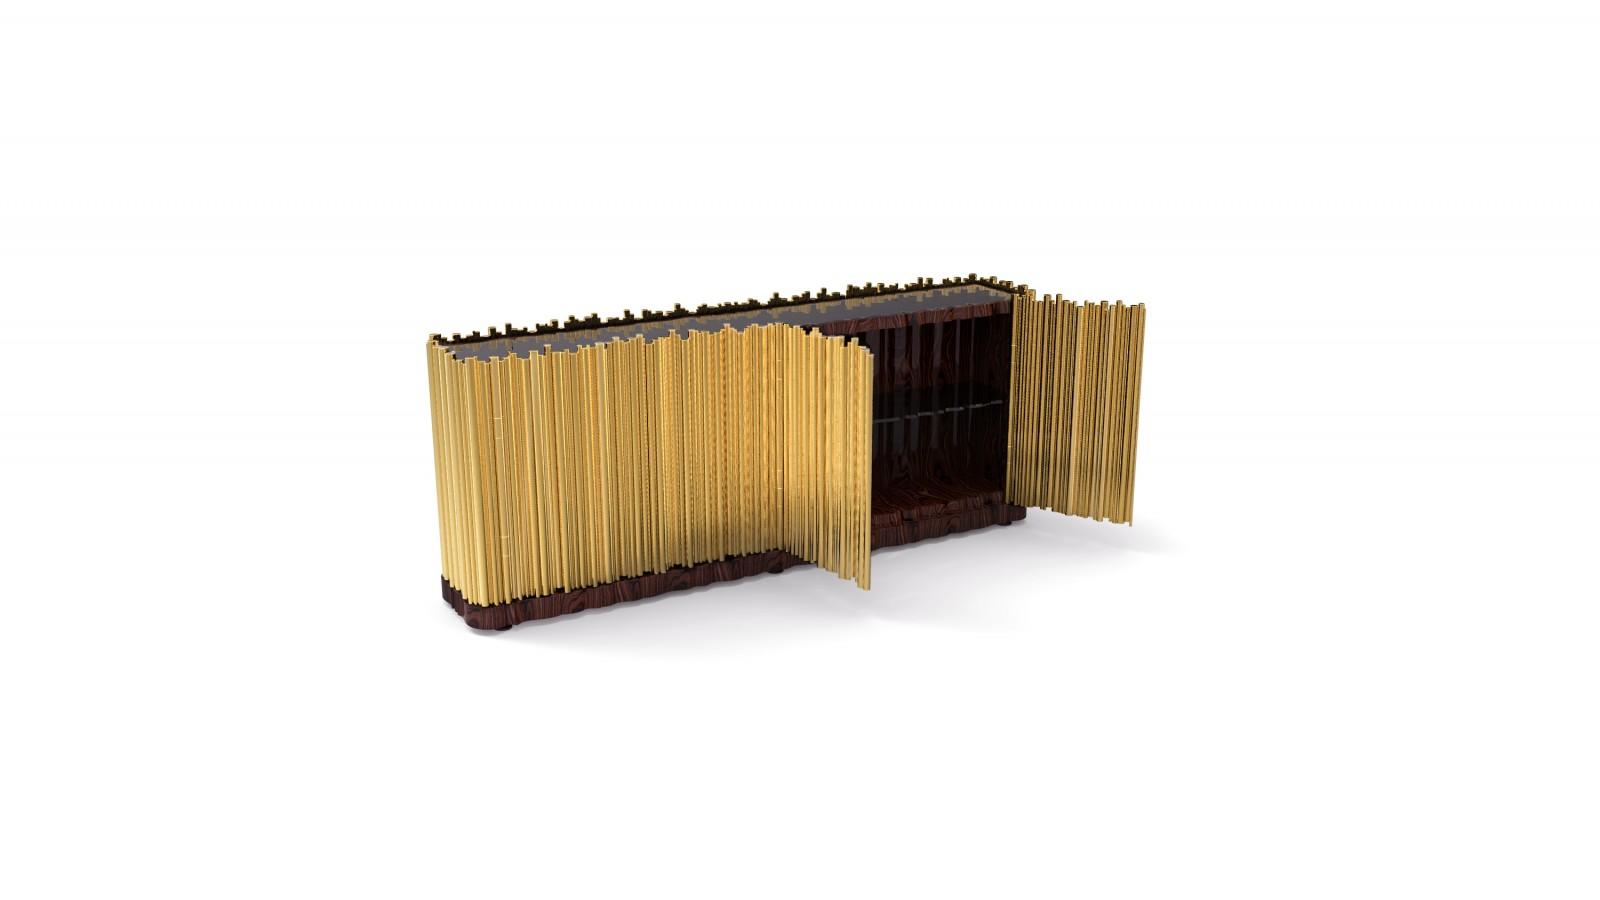 symphony-sideboard-boca-do-lobo-02